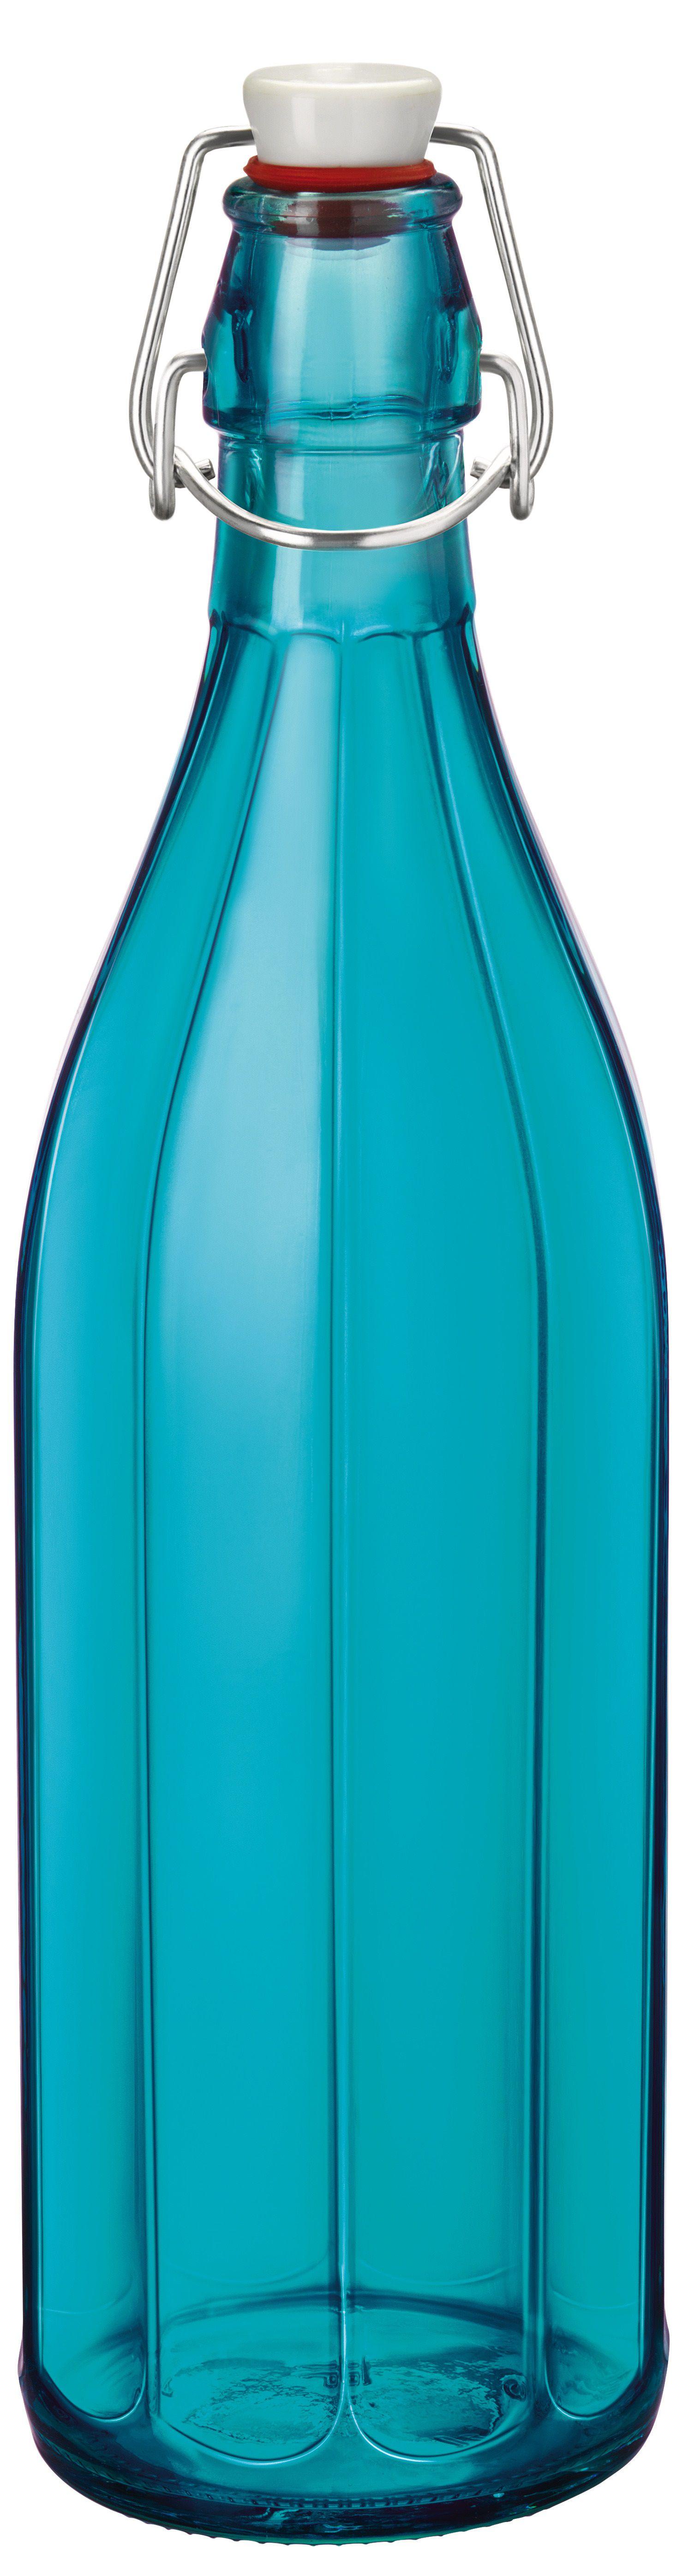 Bormioli beugelfles Oxford blauw 1 liter